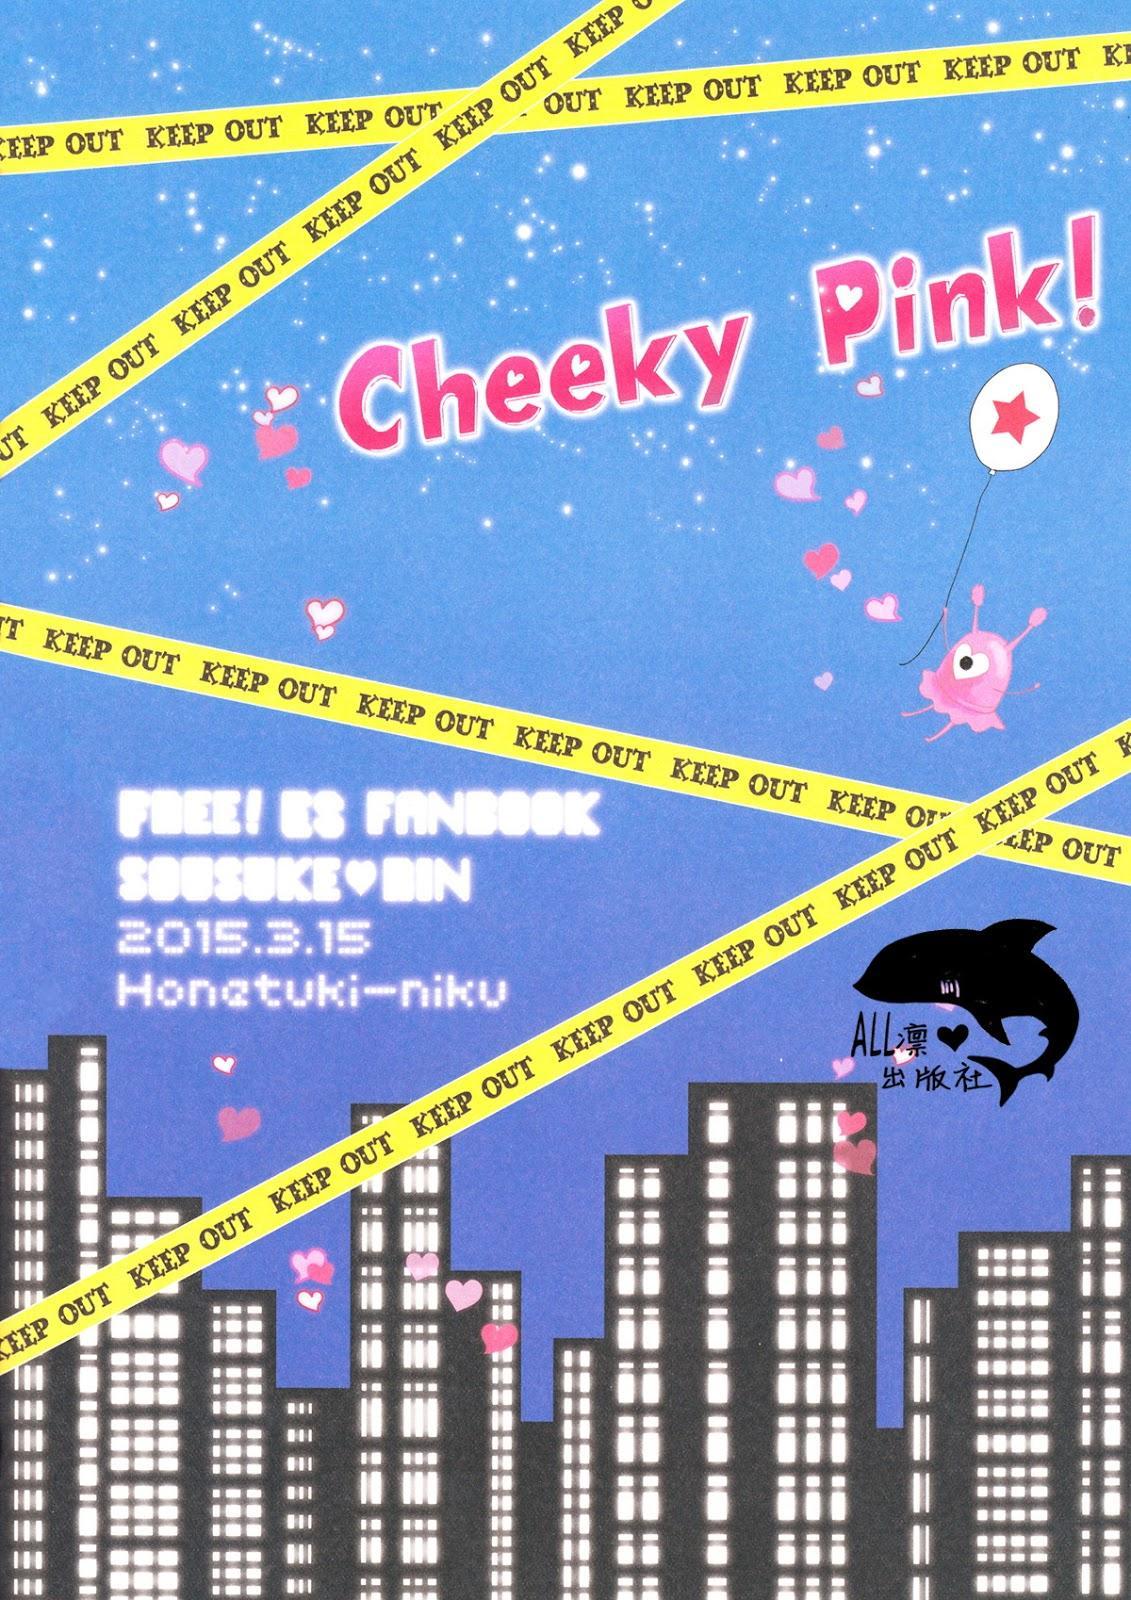 Cheeky Pink! 29